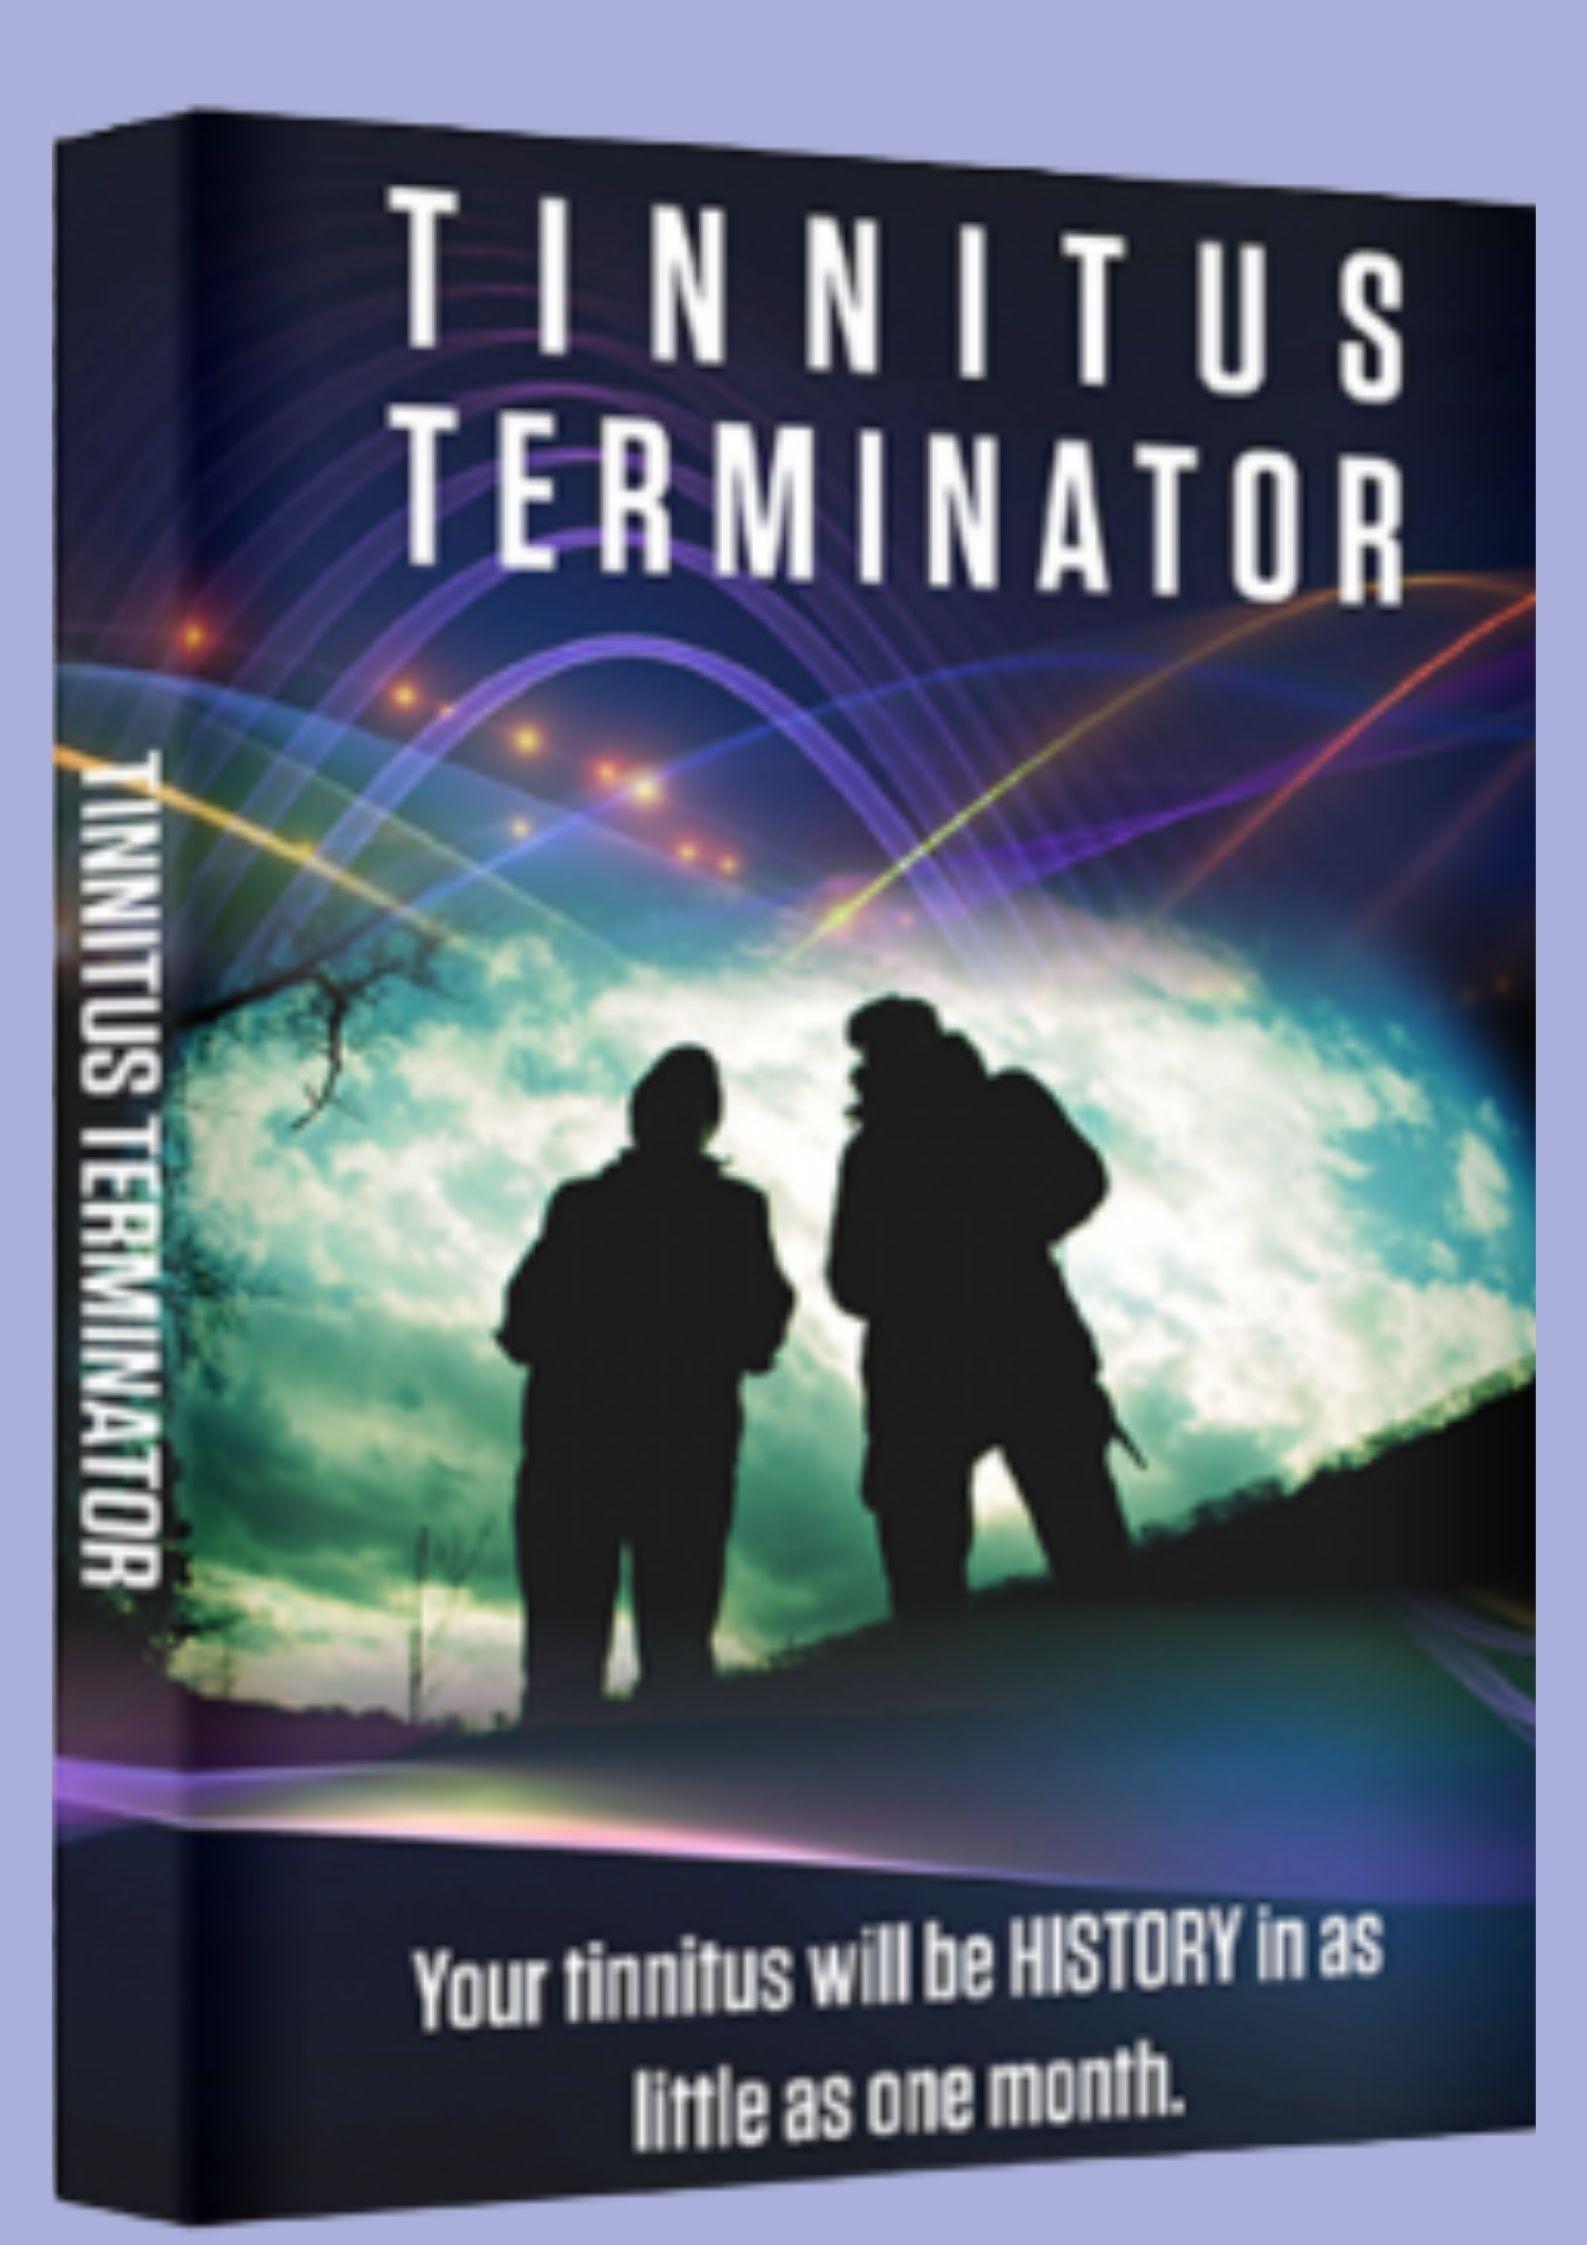 Tinnitus Terminator review